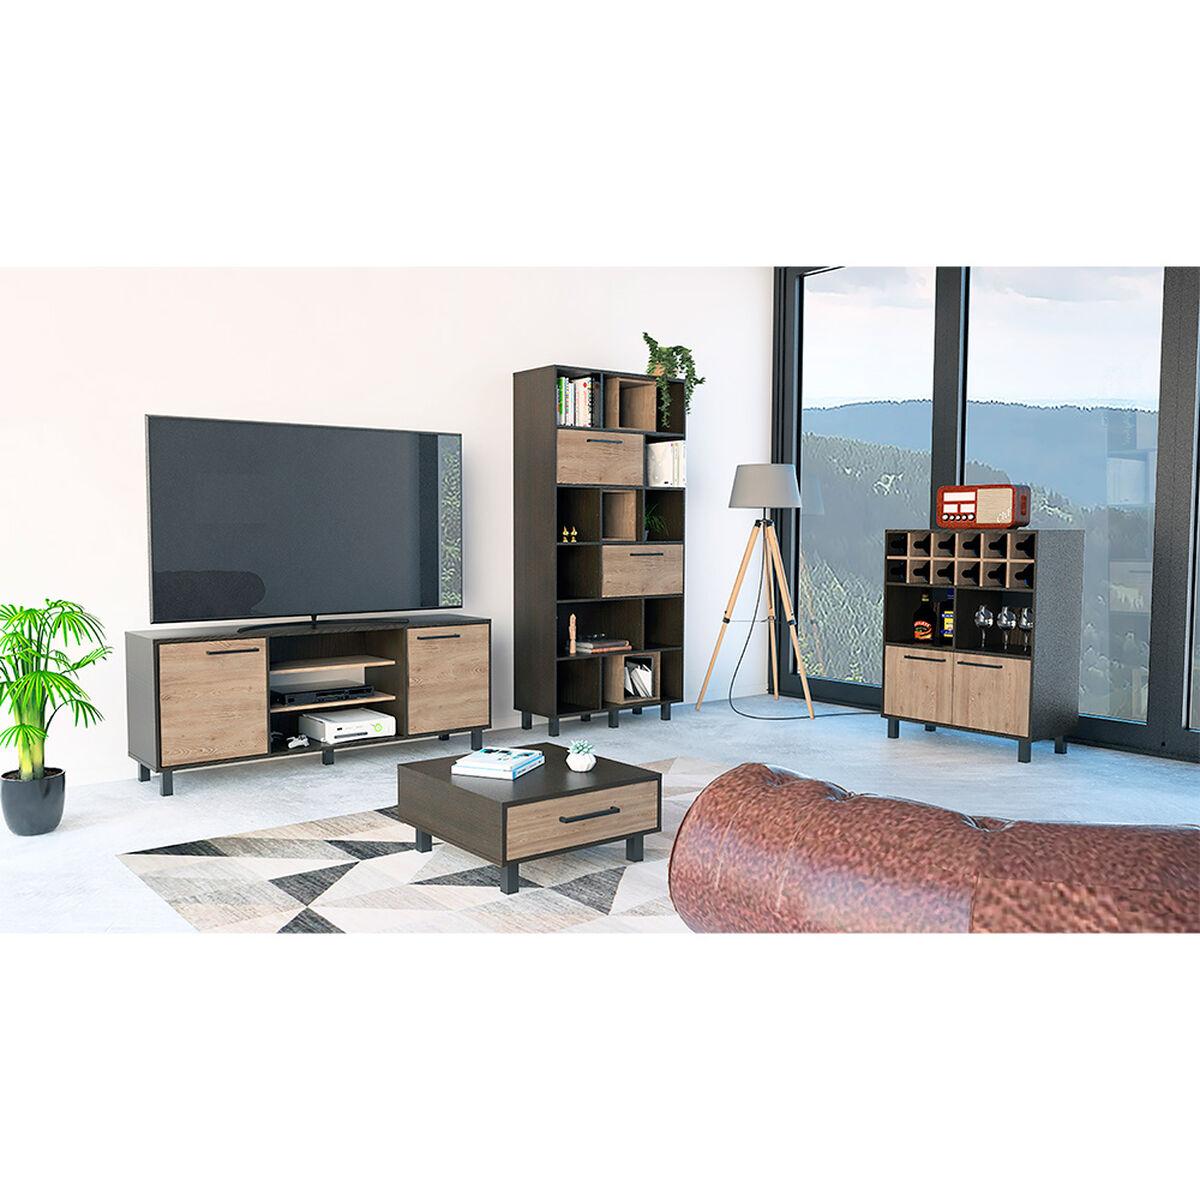 "Rack Tv 65"" + Biblioteca + Bar + Mesa Centro Kaia"